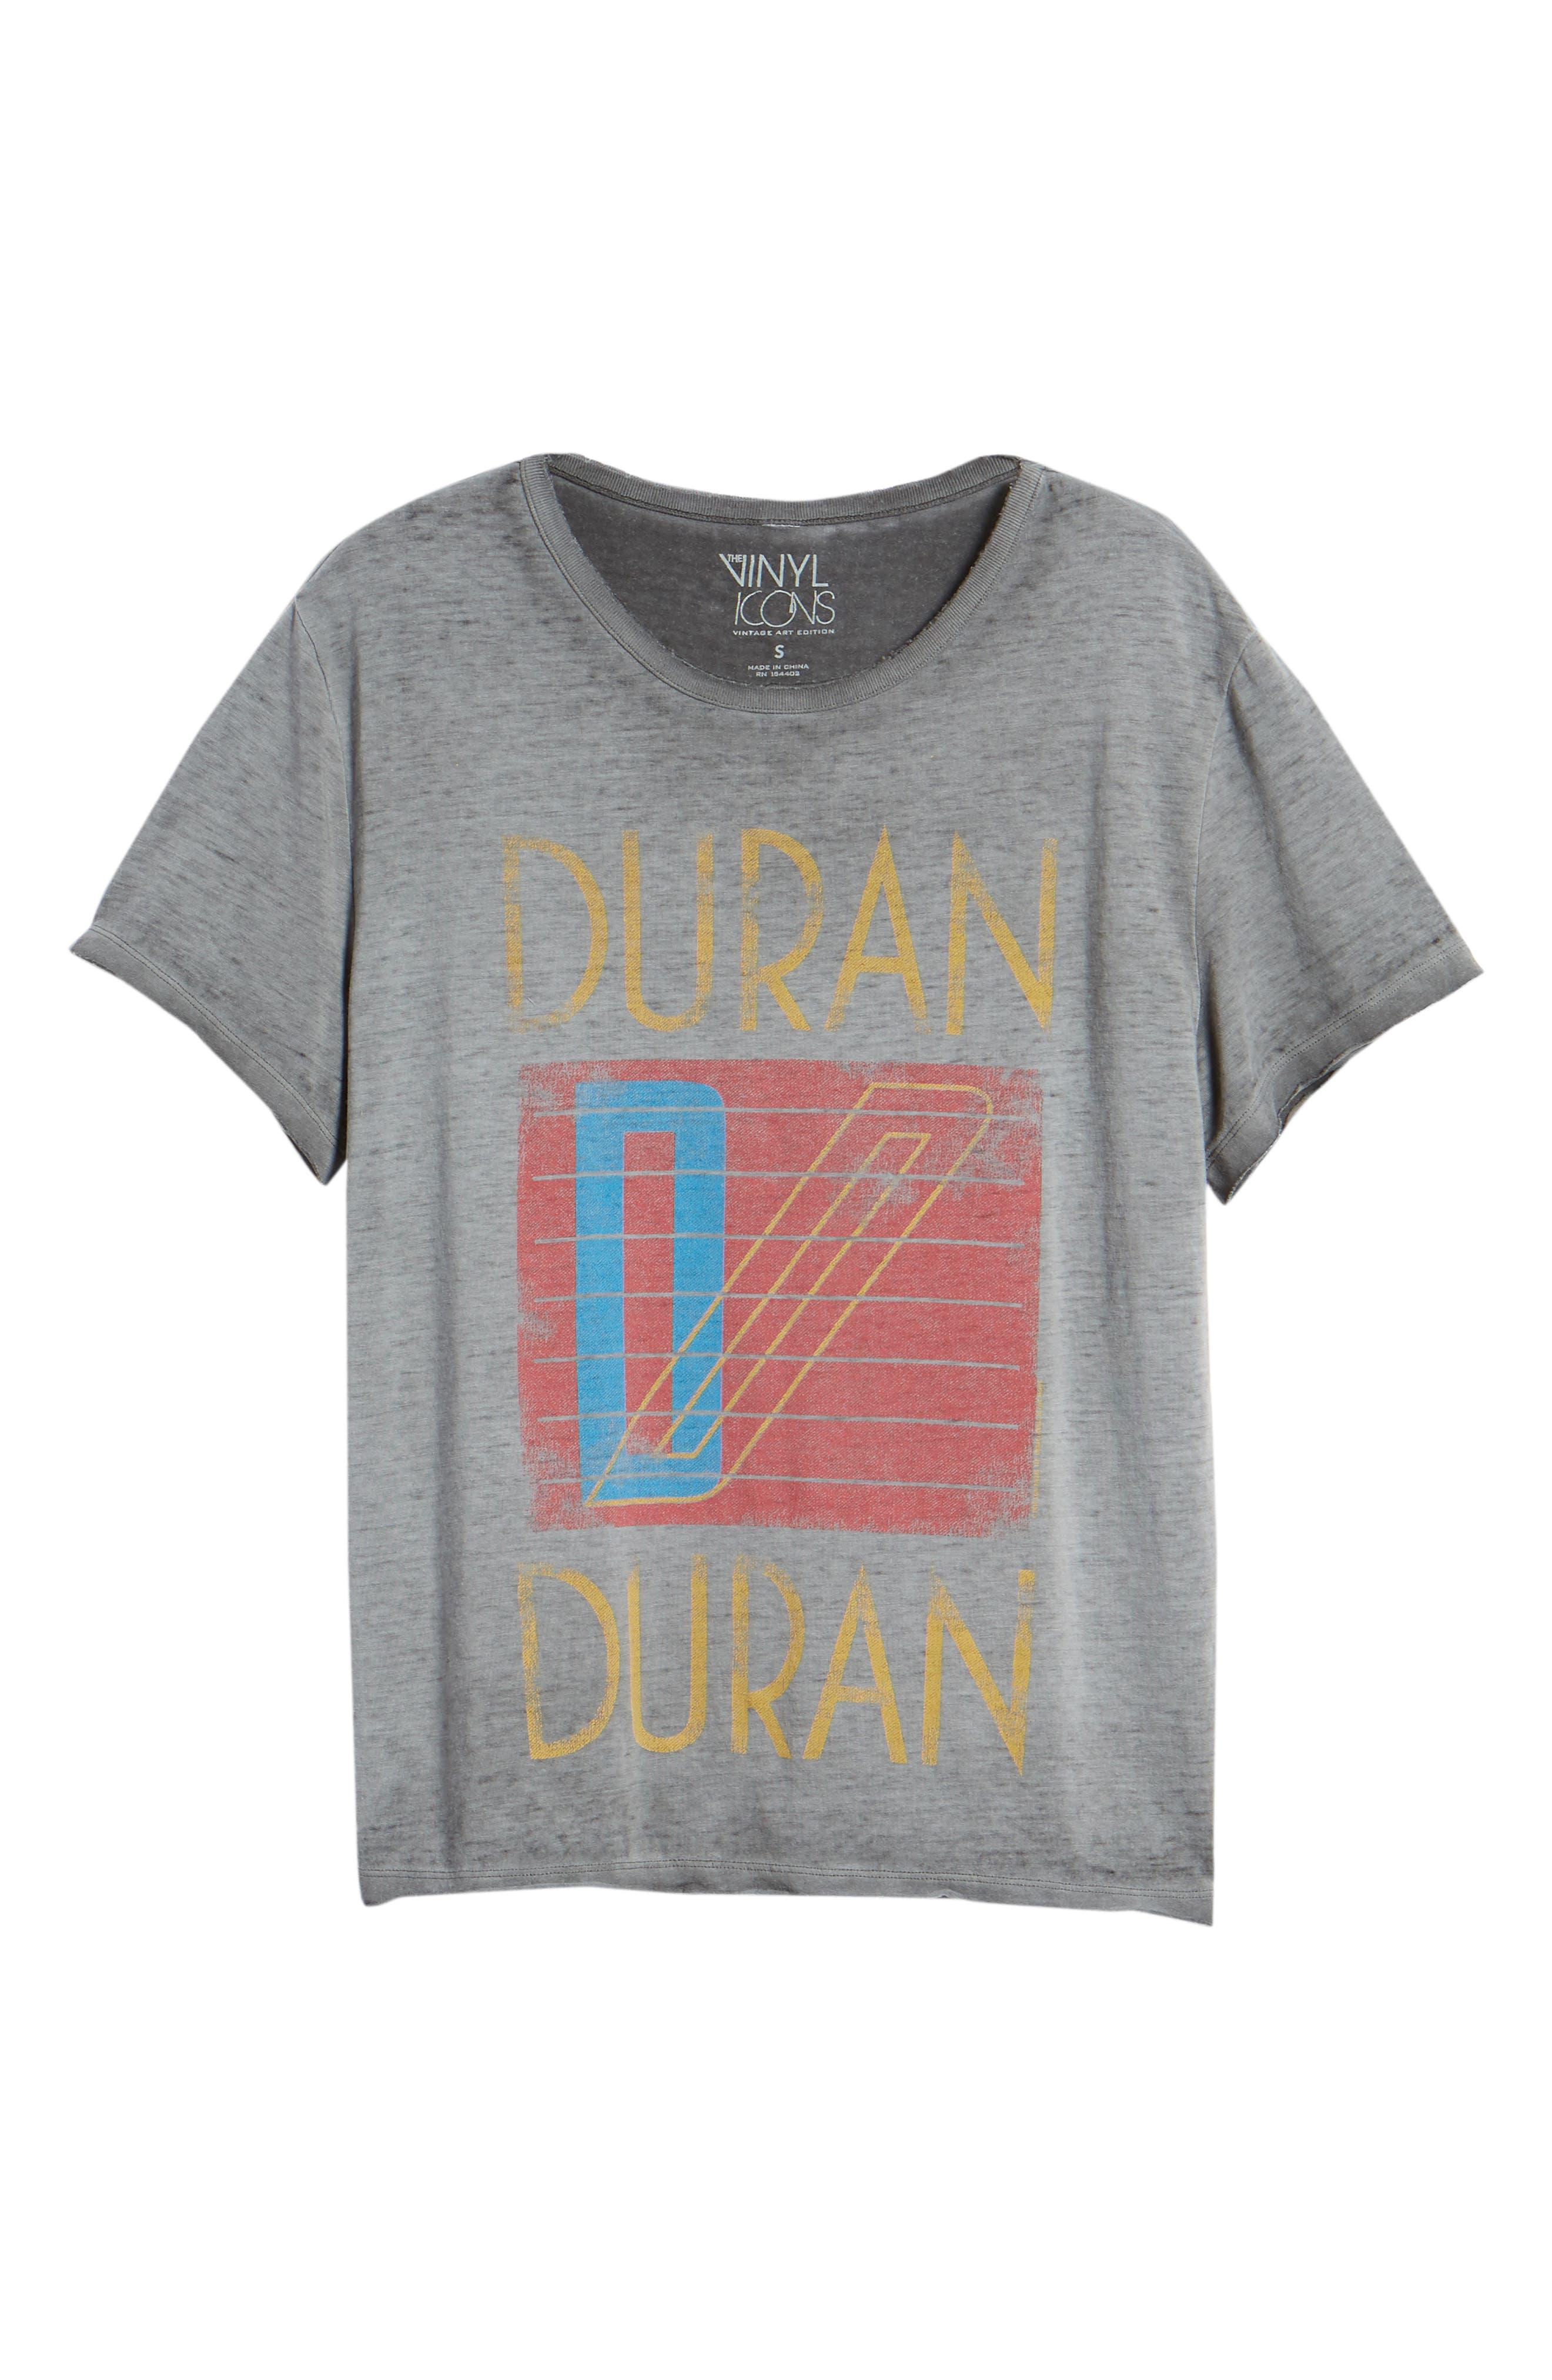 Duran Duran Tee,                             Alternate thumbnail 6, color,                             GREY